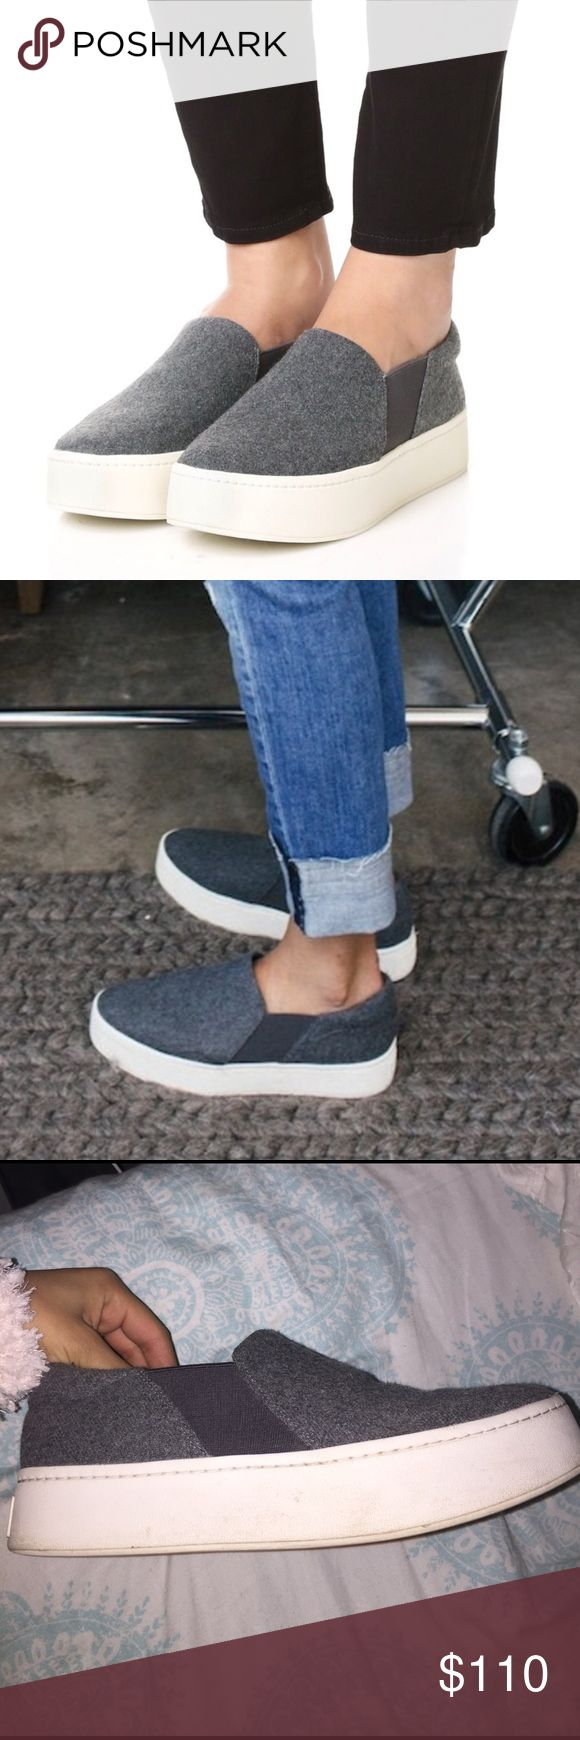 Vince Gray Platform Sneakers Gray Wool Material. Slightly worn. Vince Shoes Sneakers